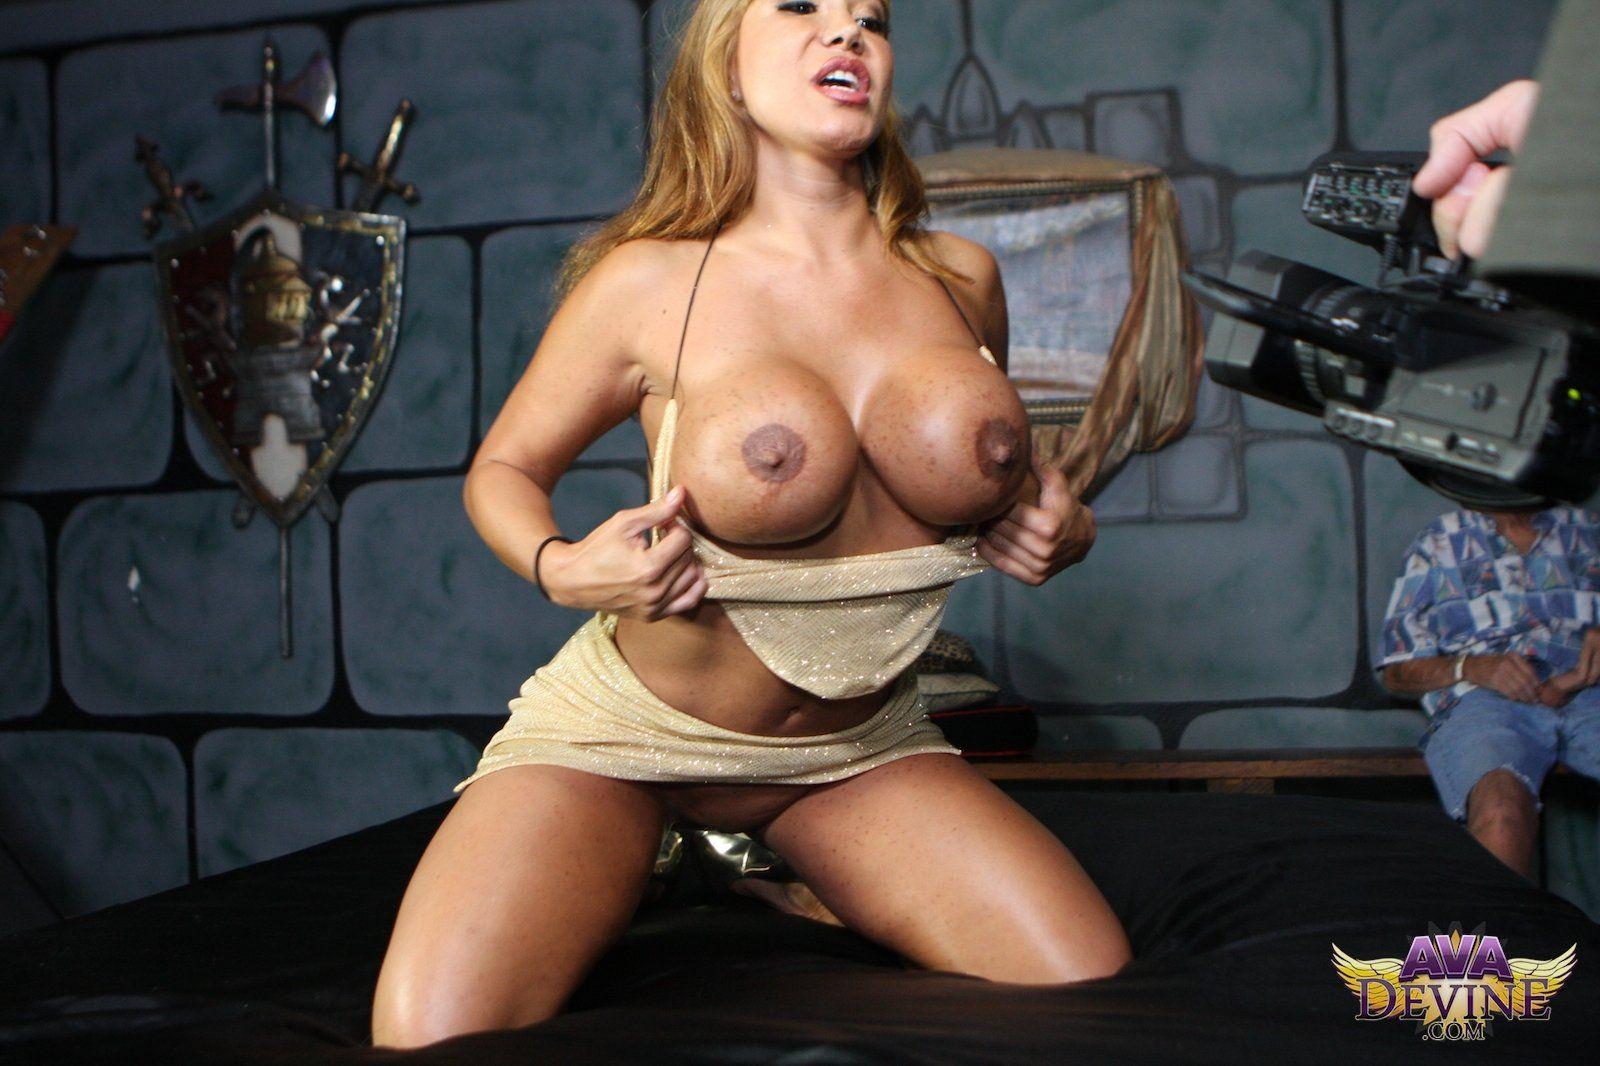 Blonde asian pornstar Blonde Asian Porn Star Very Hot Xxx 100 Free Archive